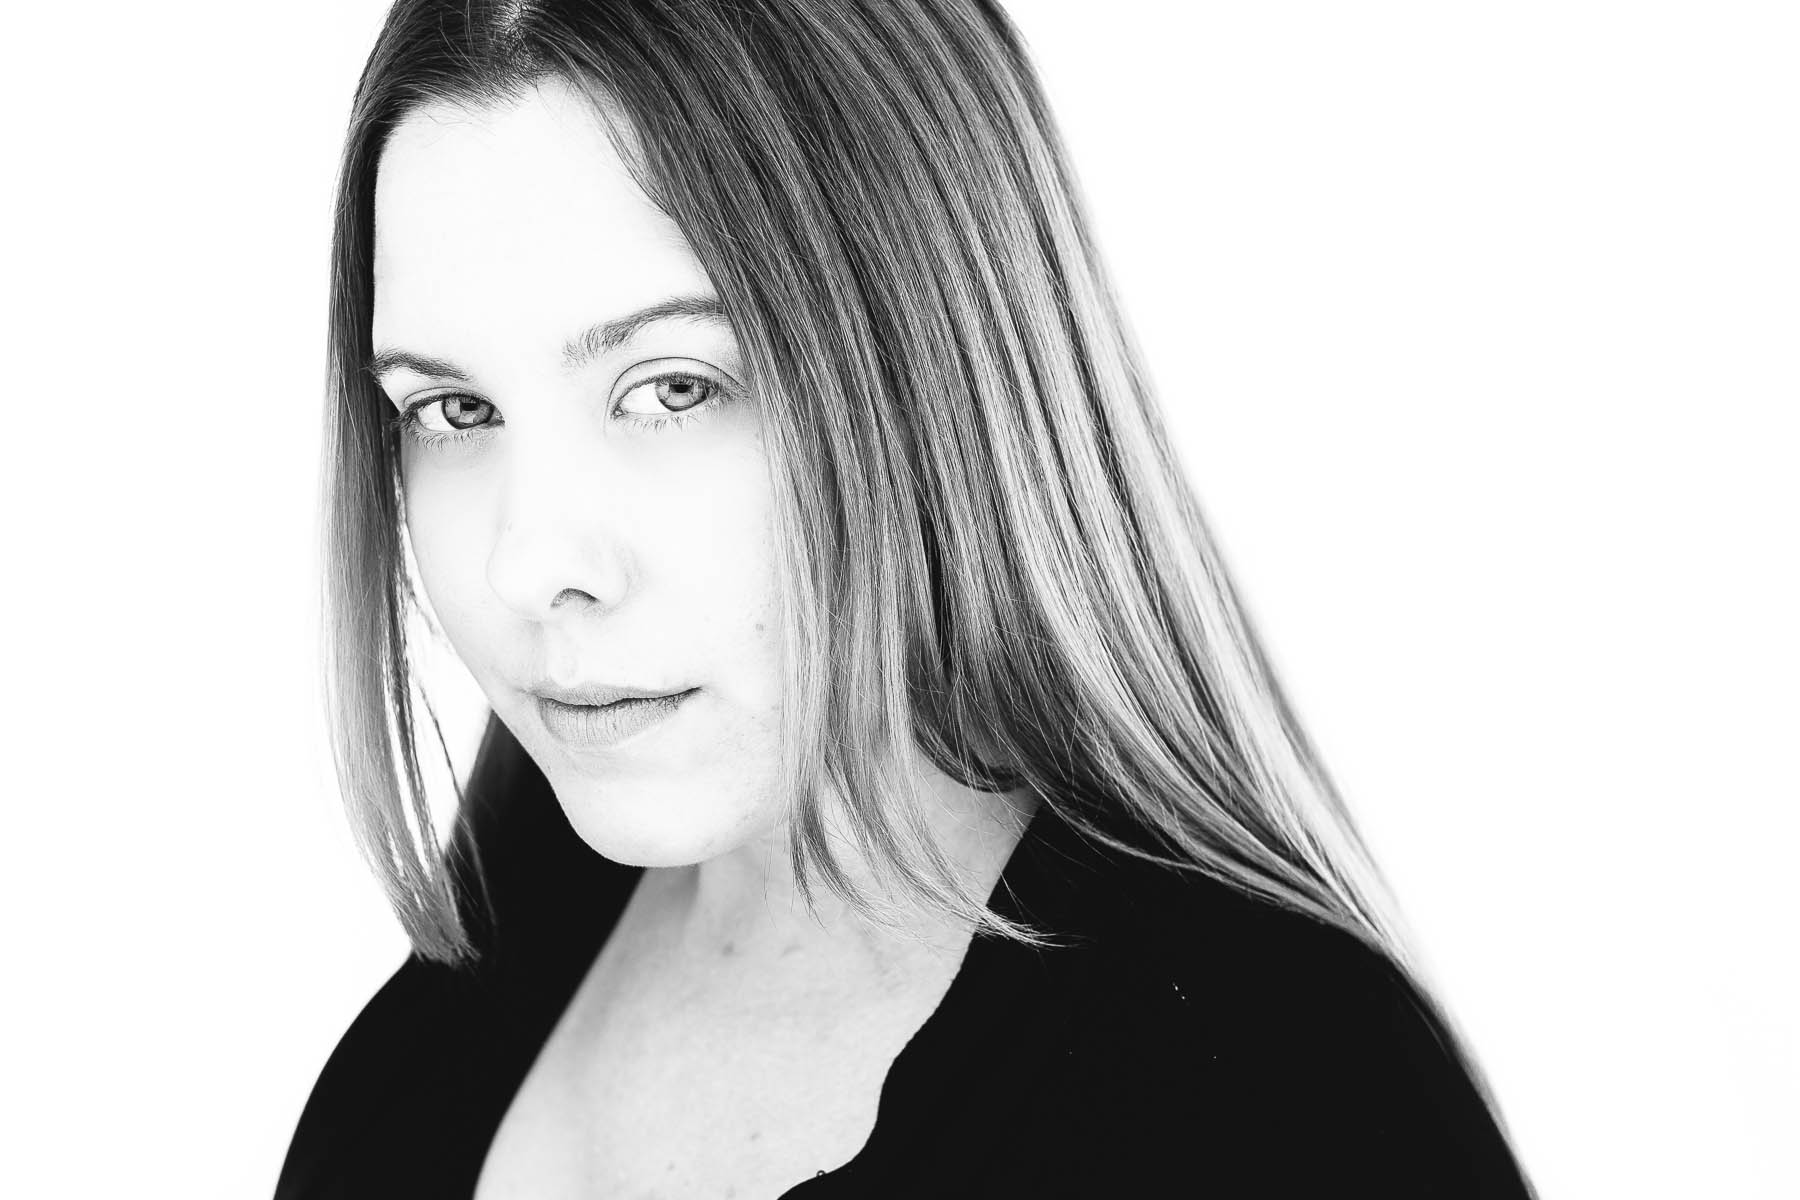 Rachel-a-headshot-session-adelaide-2.jpg